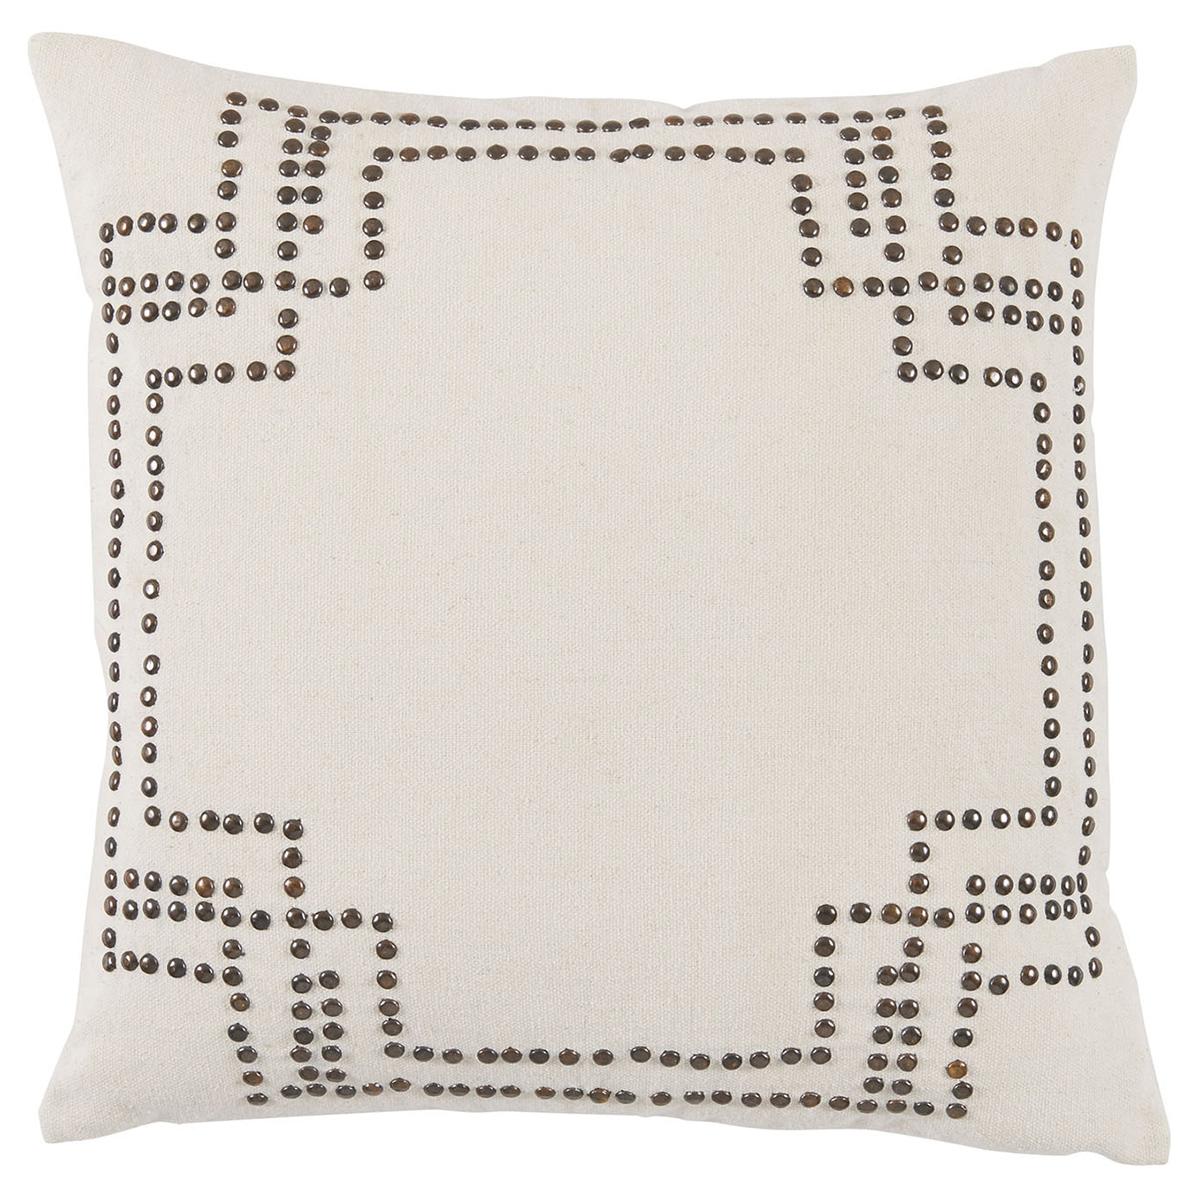 Hadid Hollywood Regency Nickel Stud Ivory Pillow - 20x20